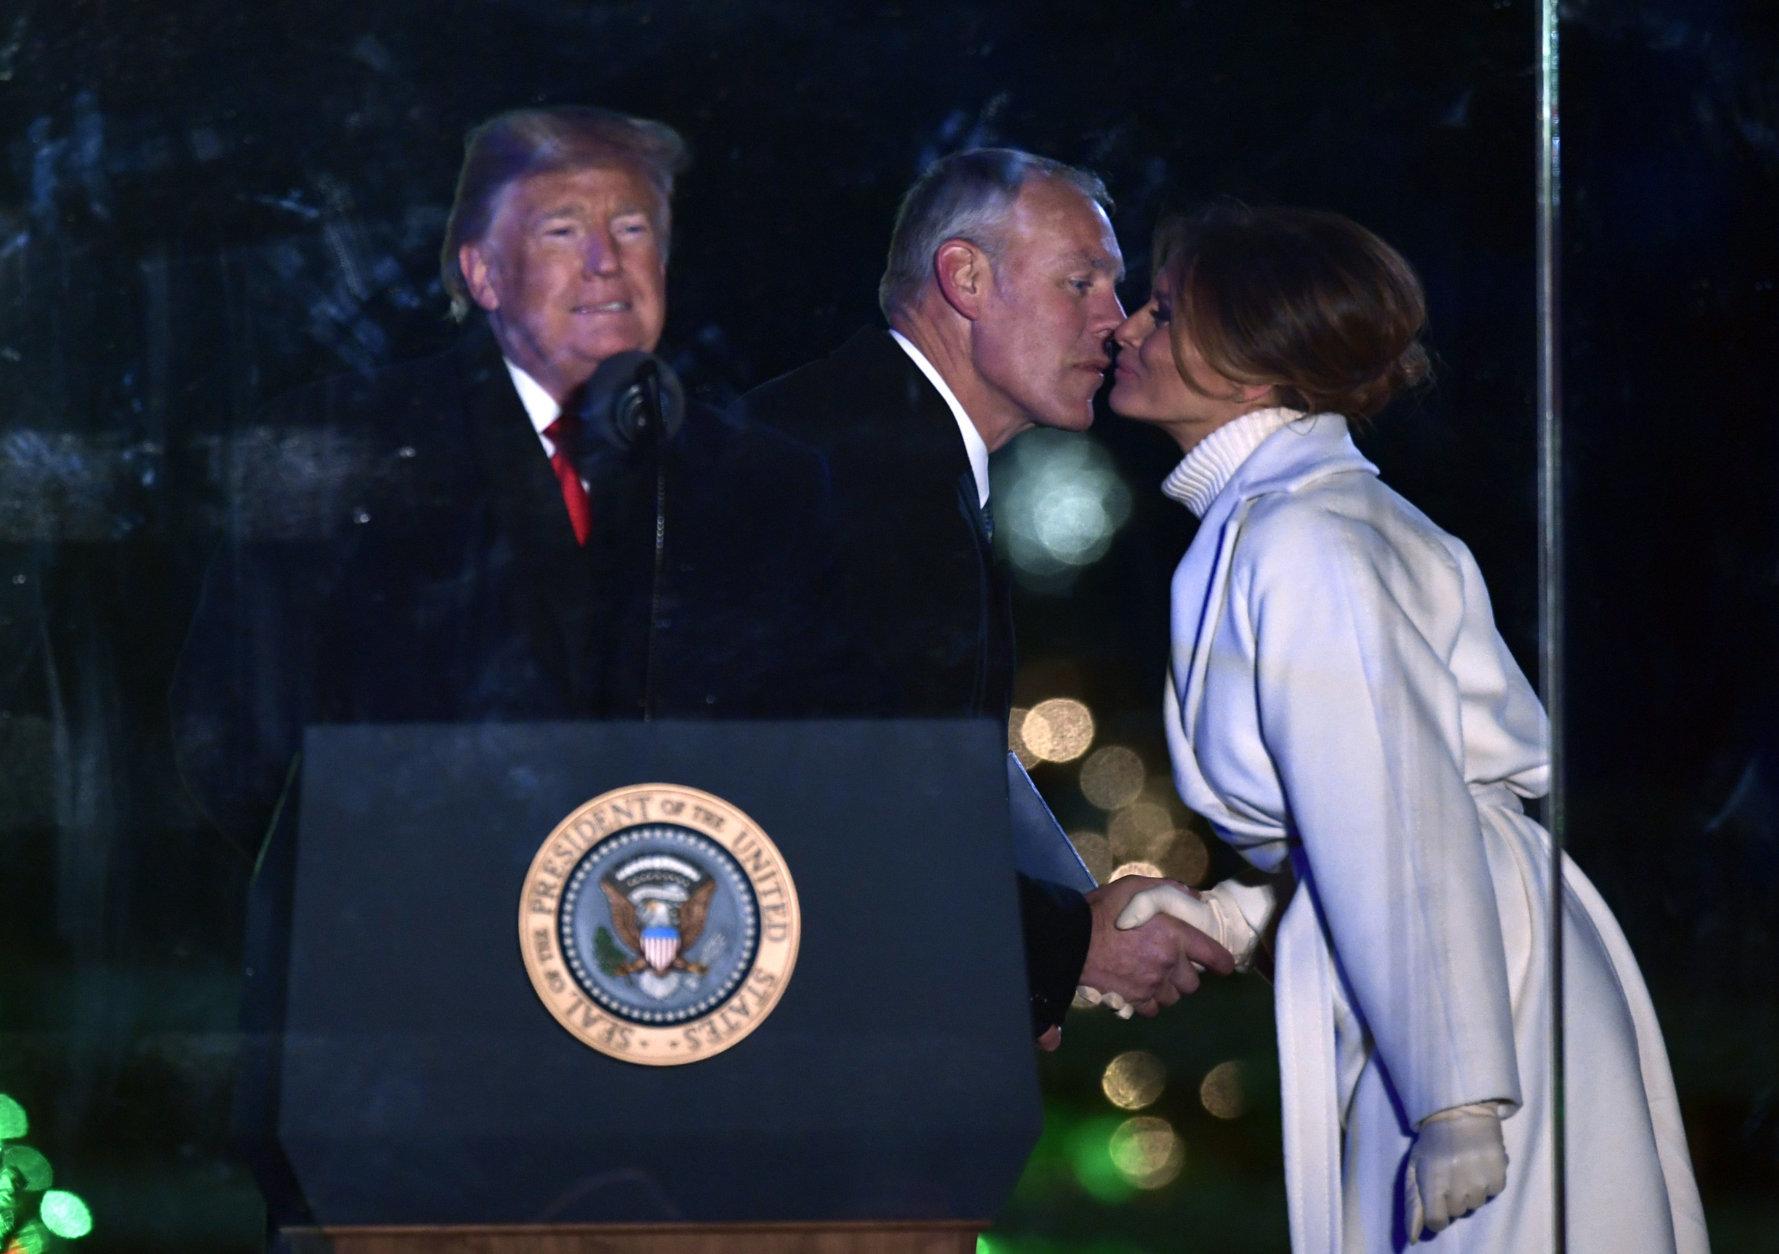 Interior Secretary Ryan Zinke greets first lady Melania Trump before President Donald Trump speaks during the National Christmas Tree Lighting ceremony on the Ellipse in Washington, Wednesday, Nov. 28, 2018. (AP Photo/Susan Walsh)